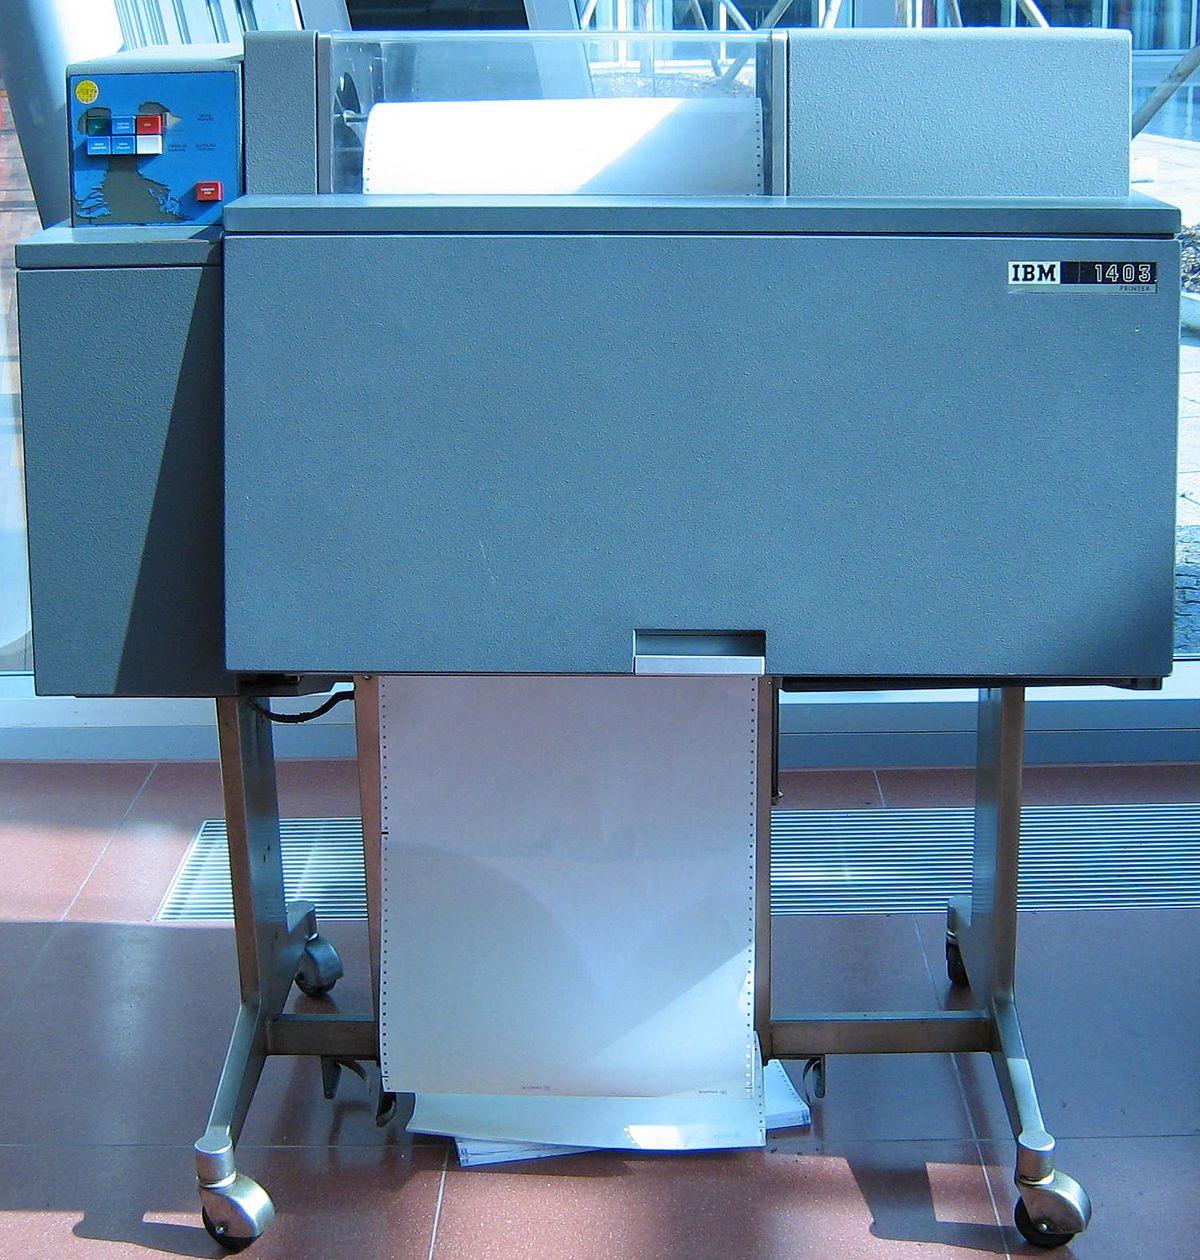 line printer wikipedia